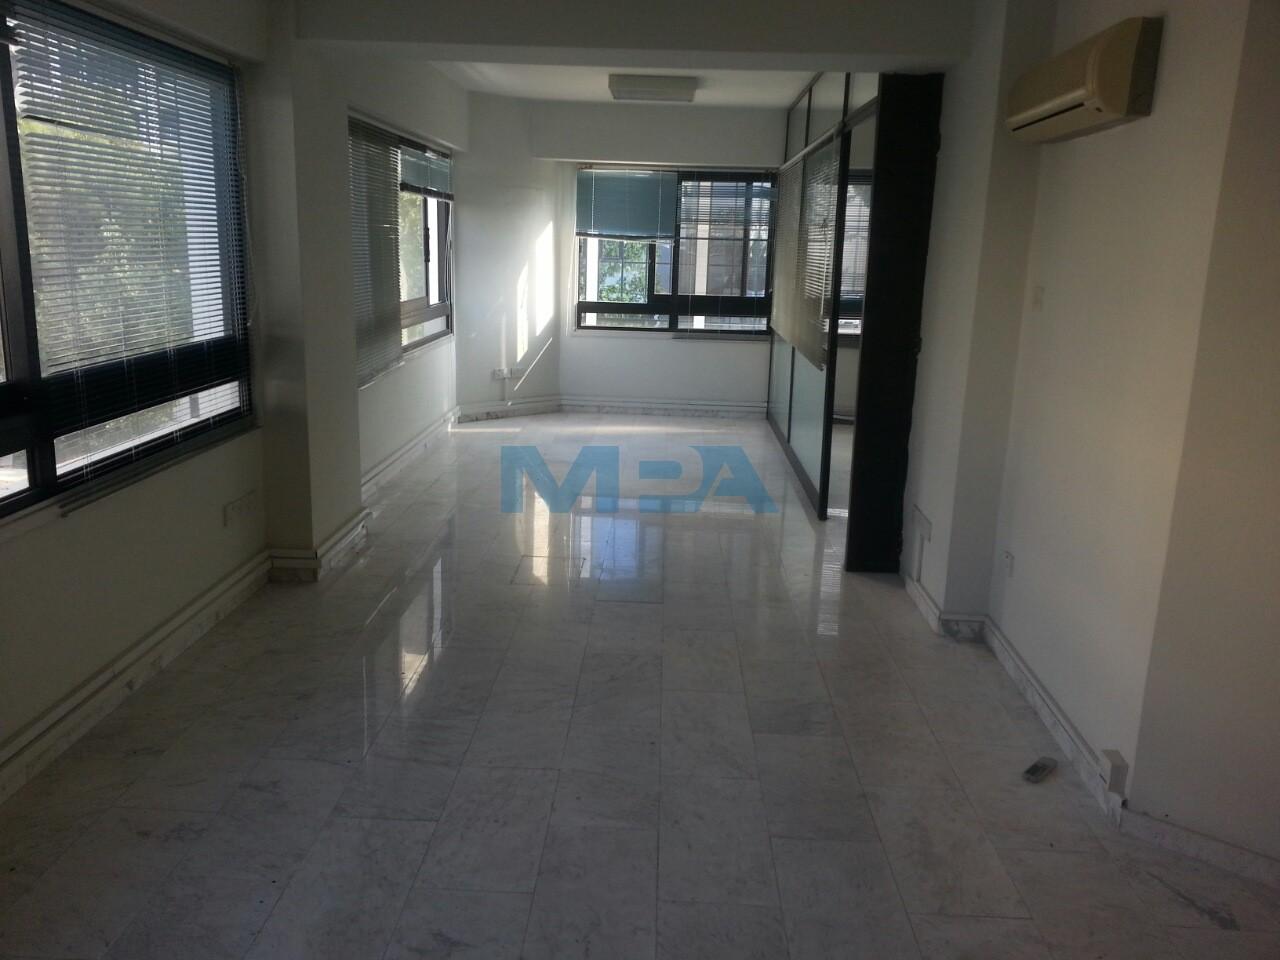 Office For Rent in Nicosias City Center  60 SqMt Nicosias Ci.....